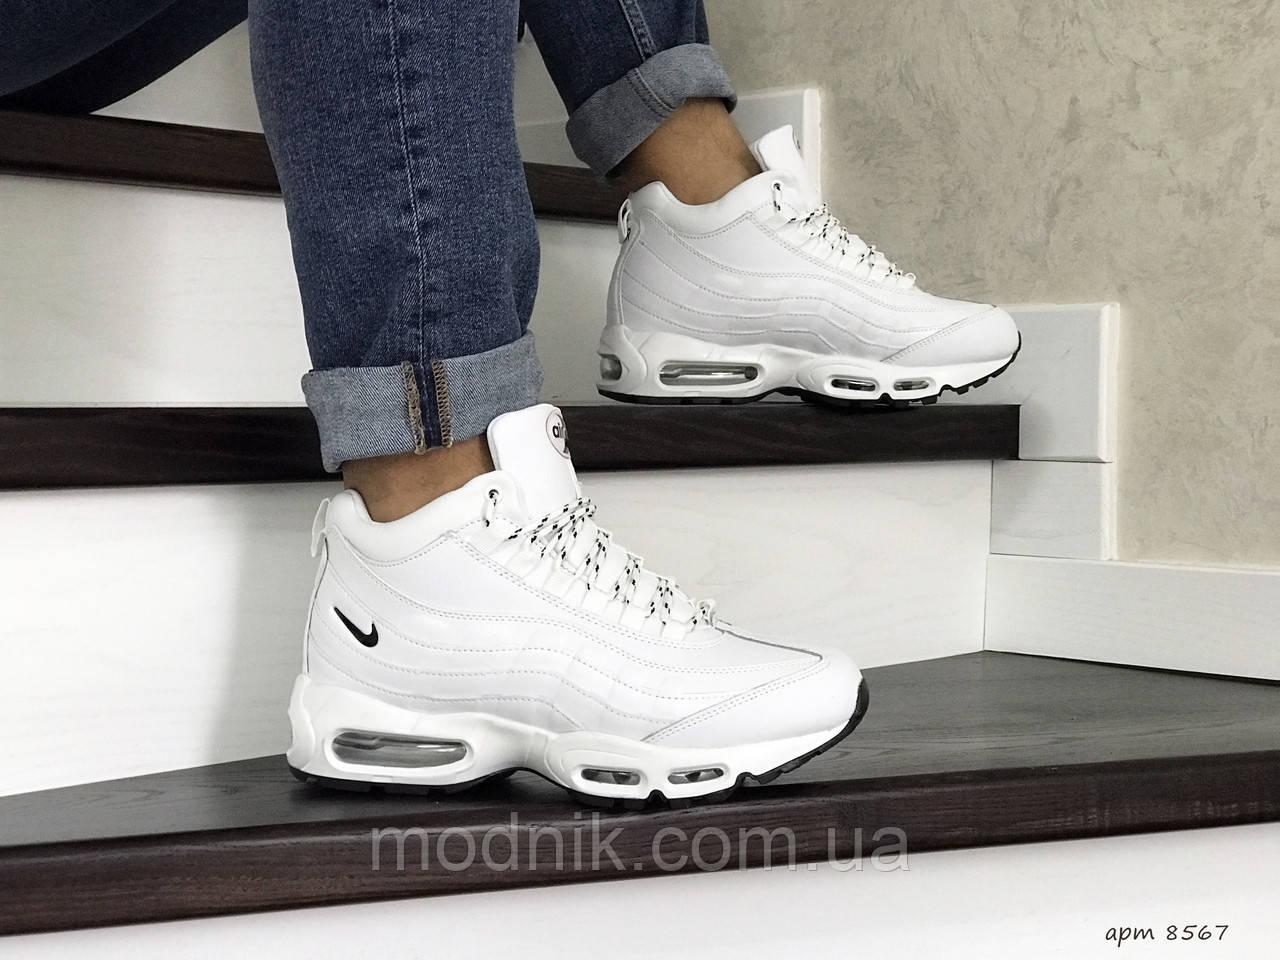 Мужские кроссовки Nike 95 (белые) ЗИМА